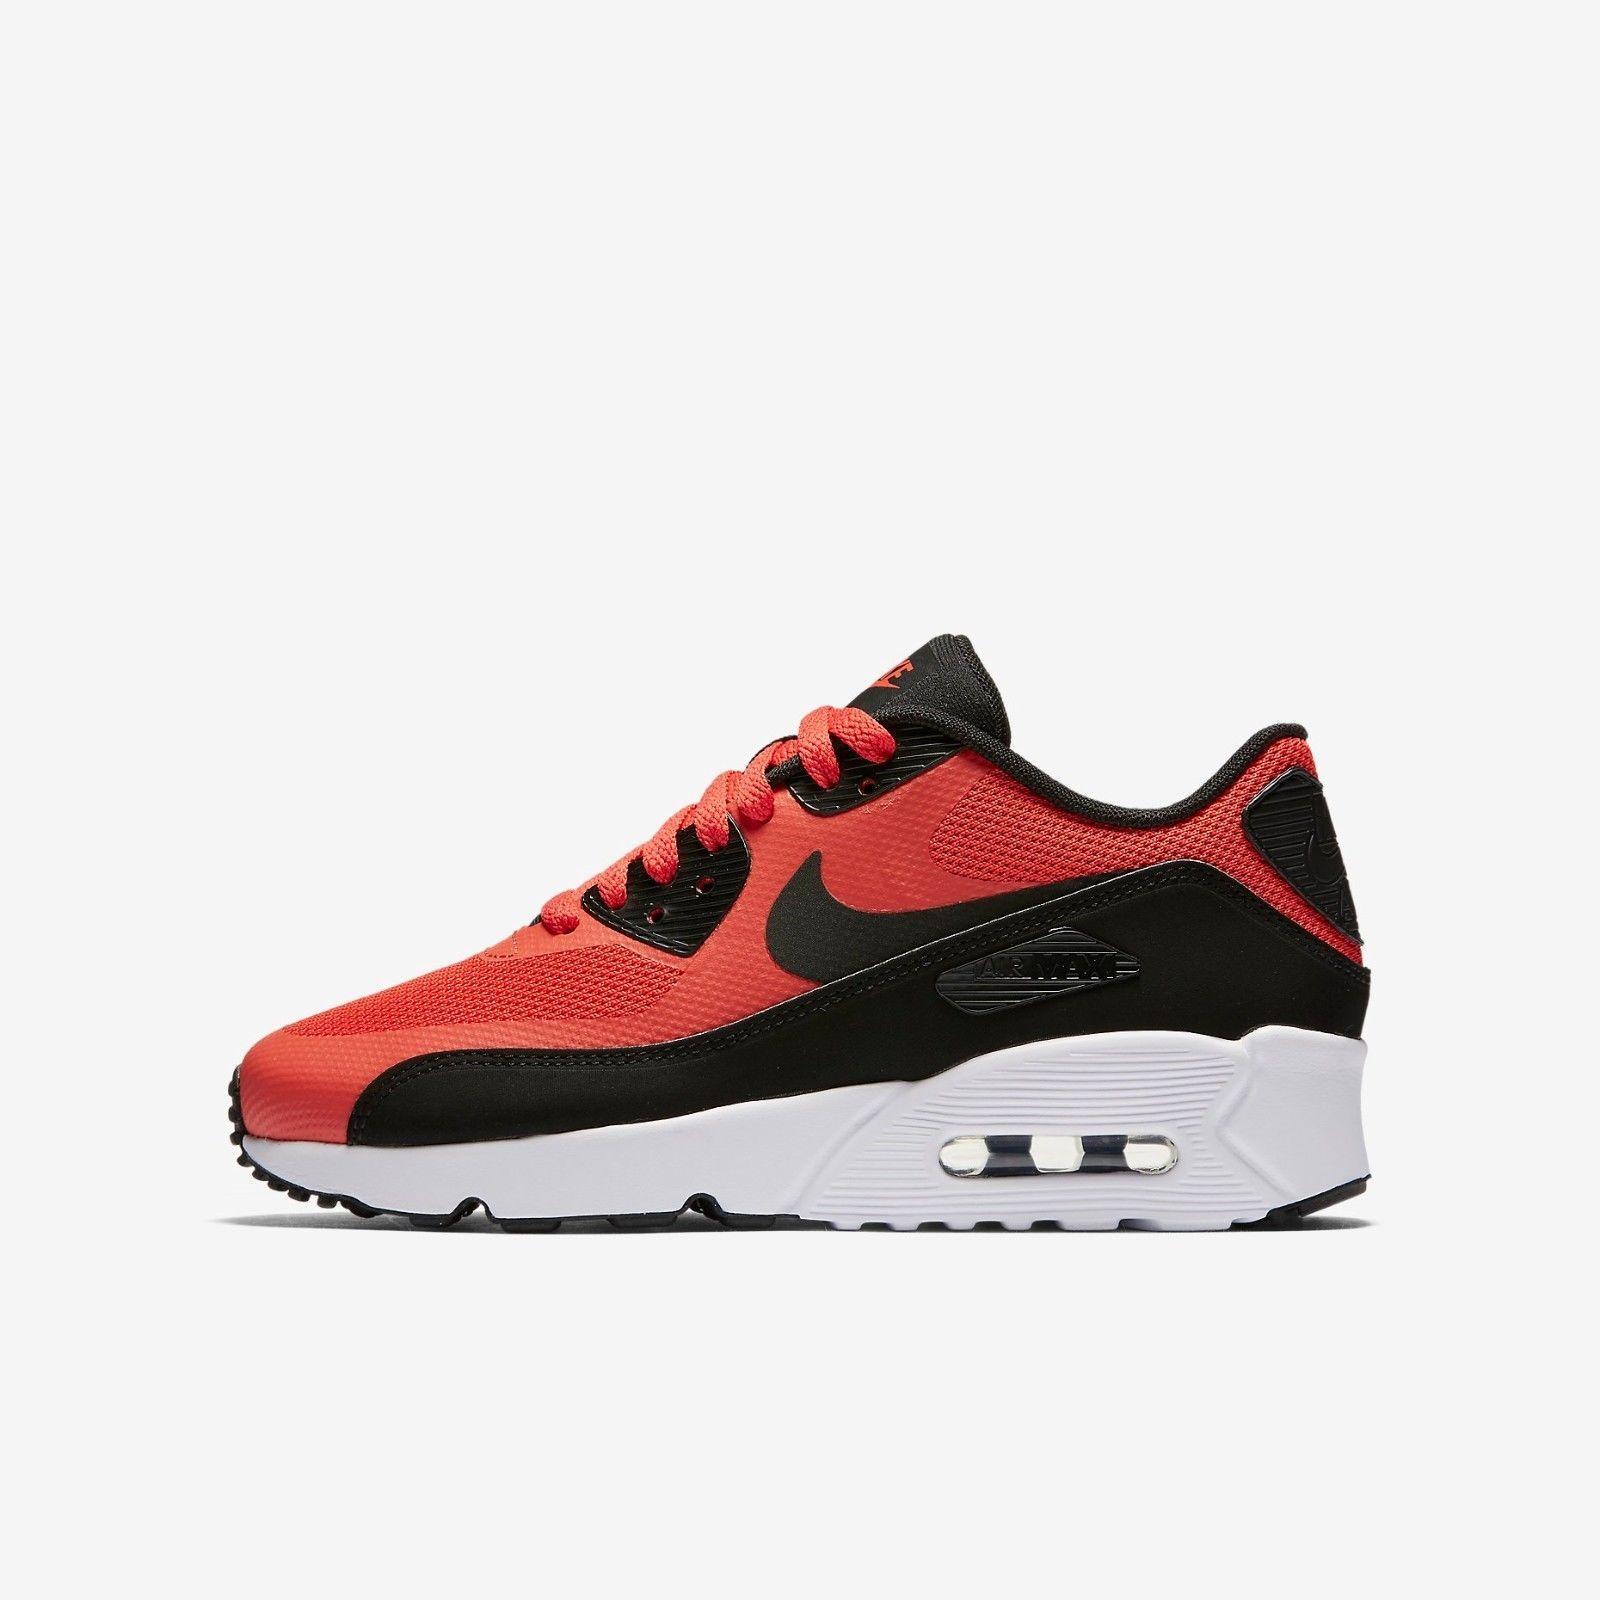 Nike Air Max Shoes (1980s): 1 listing